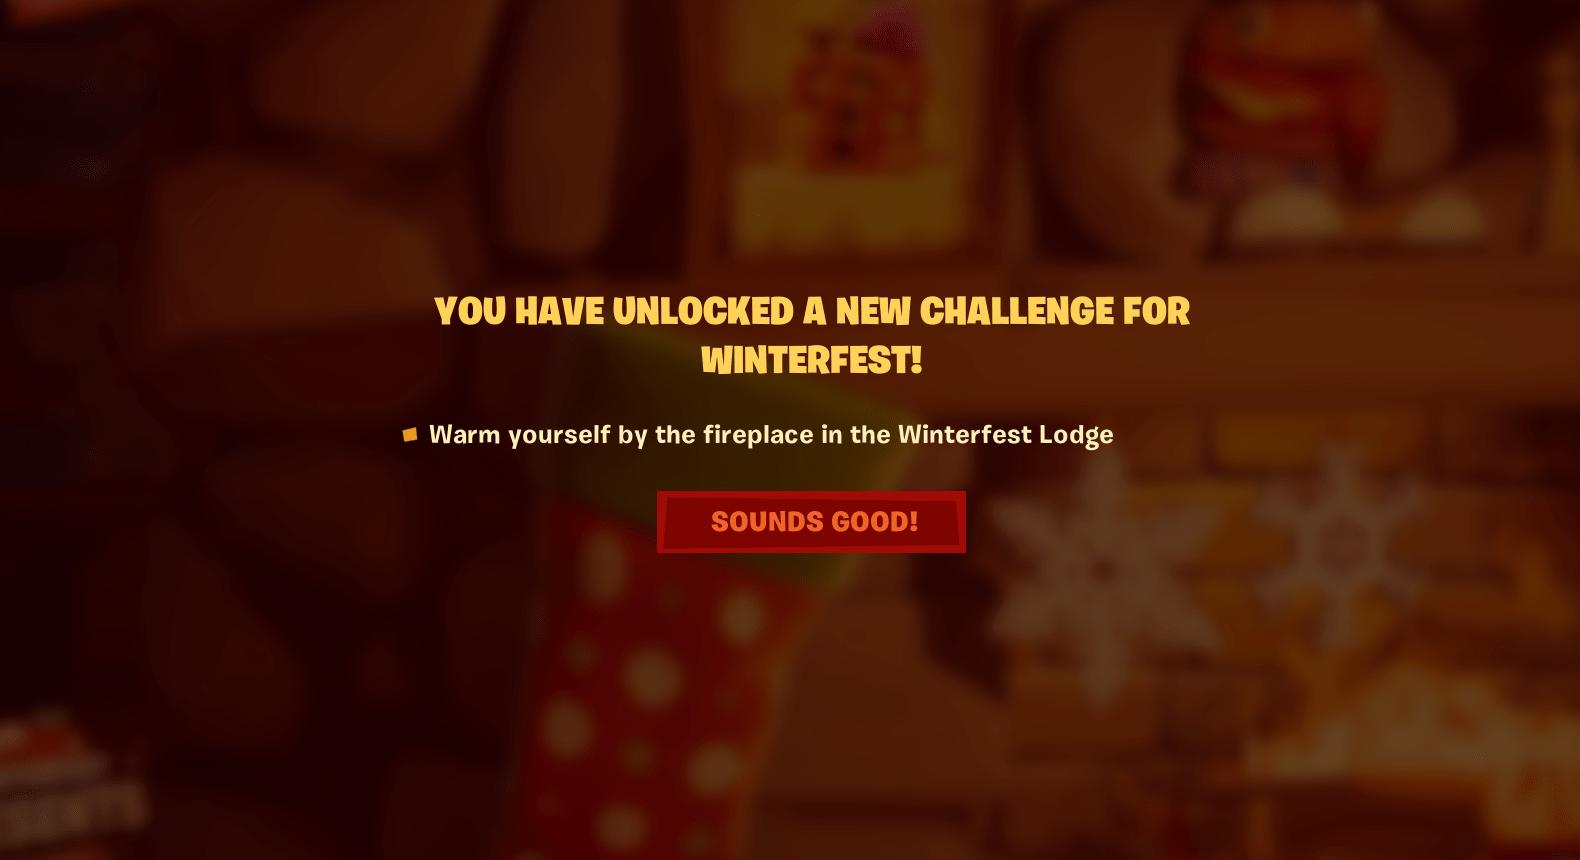 Fortnite Winterfest Day 5 Challenge Unlocked